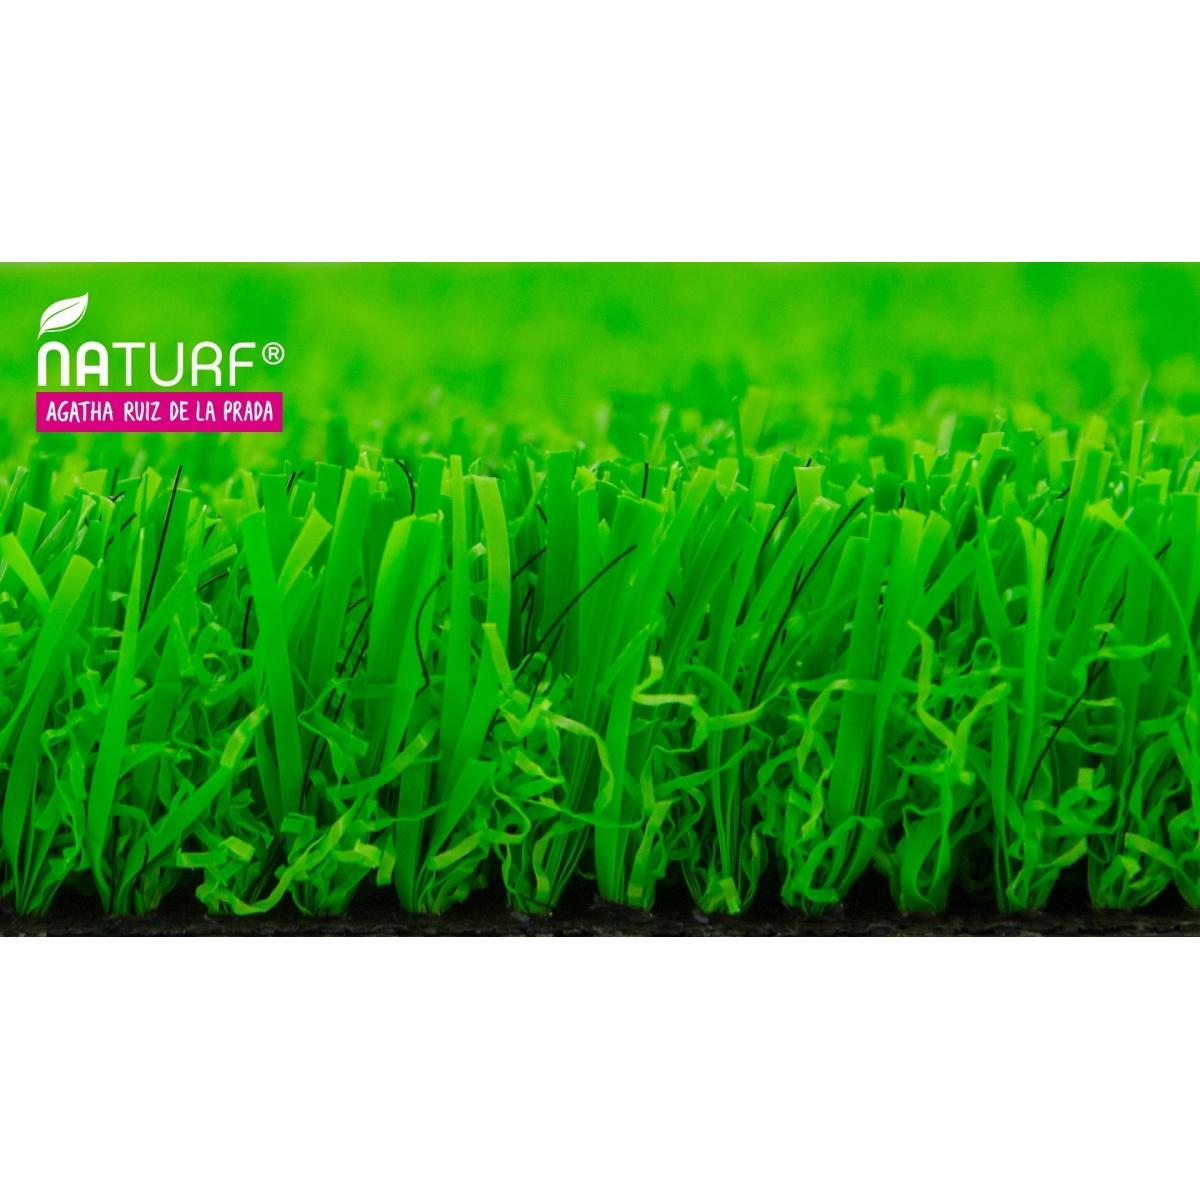 Naturf Cesped artificial Verde Serie Agatha